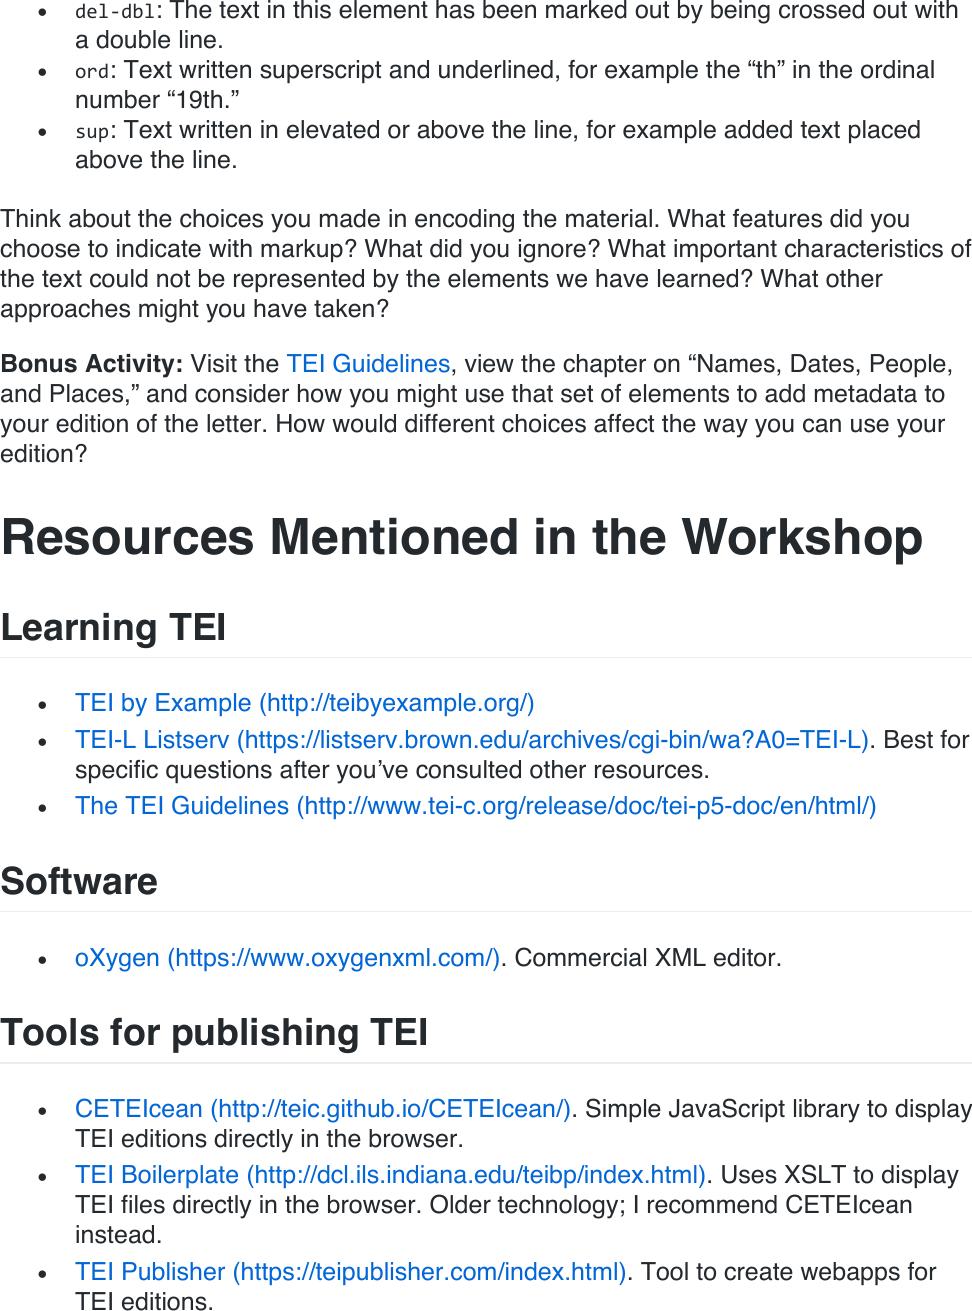 Tei workshop instructions